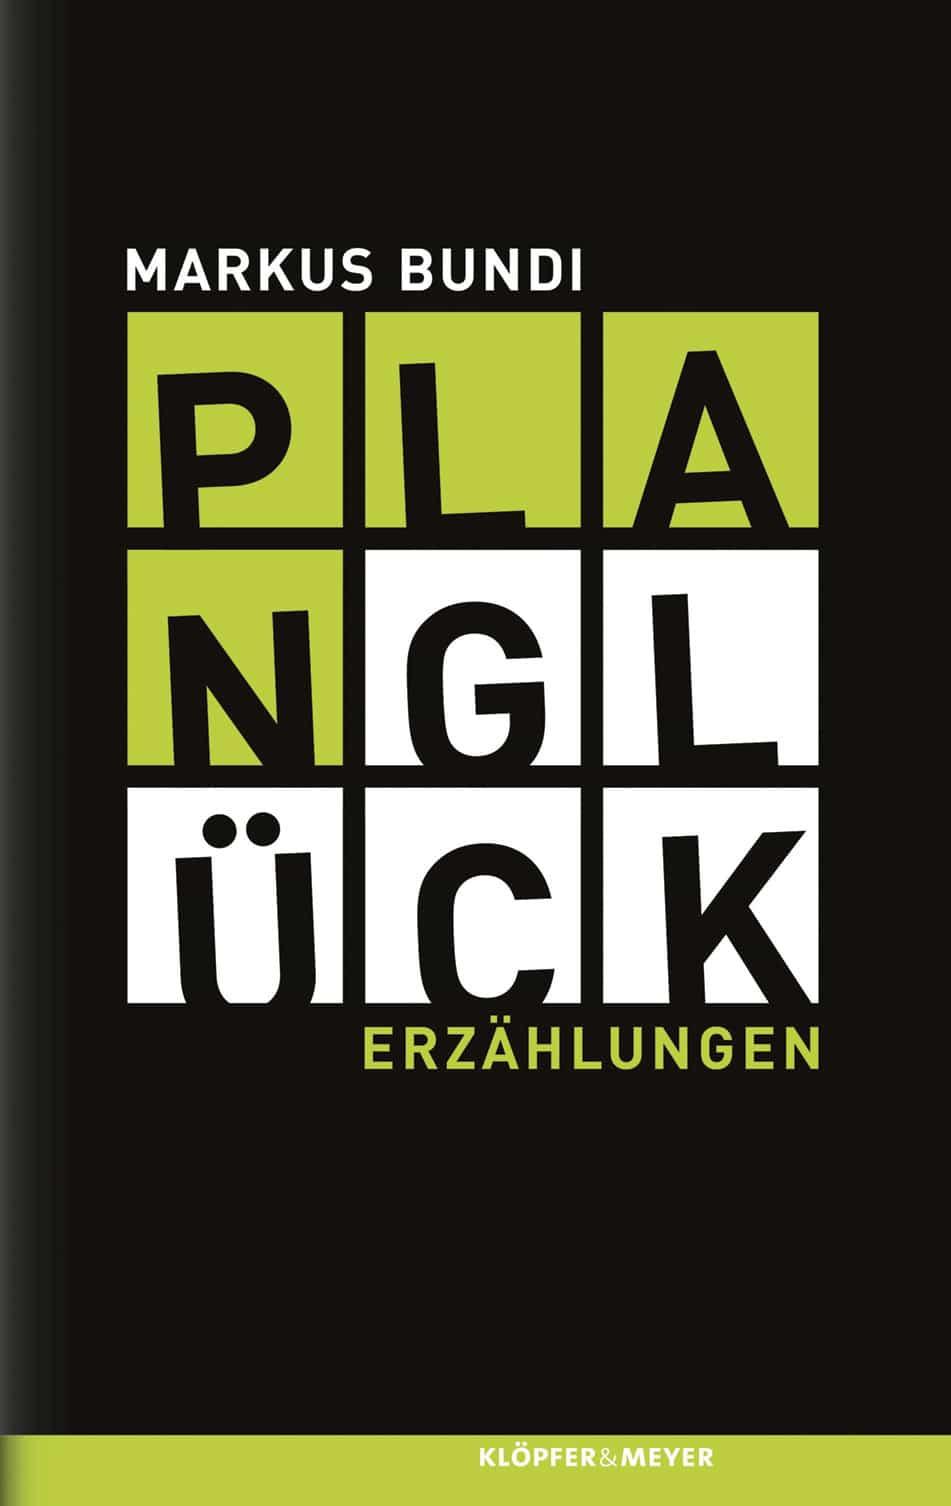 Markus Bundi: «Planglück»